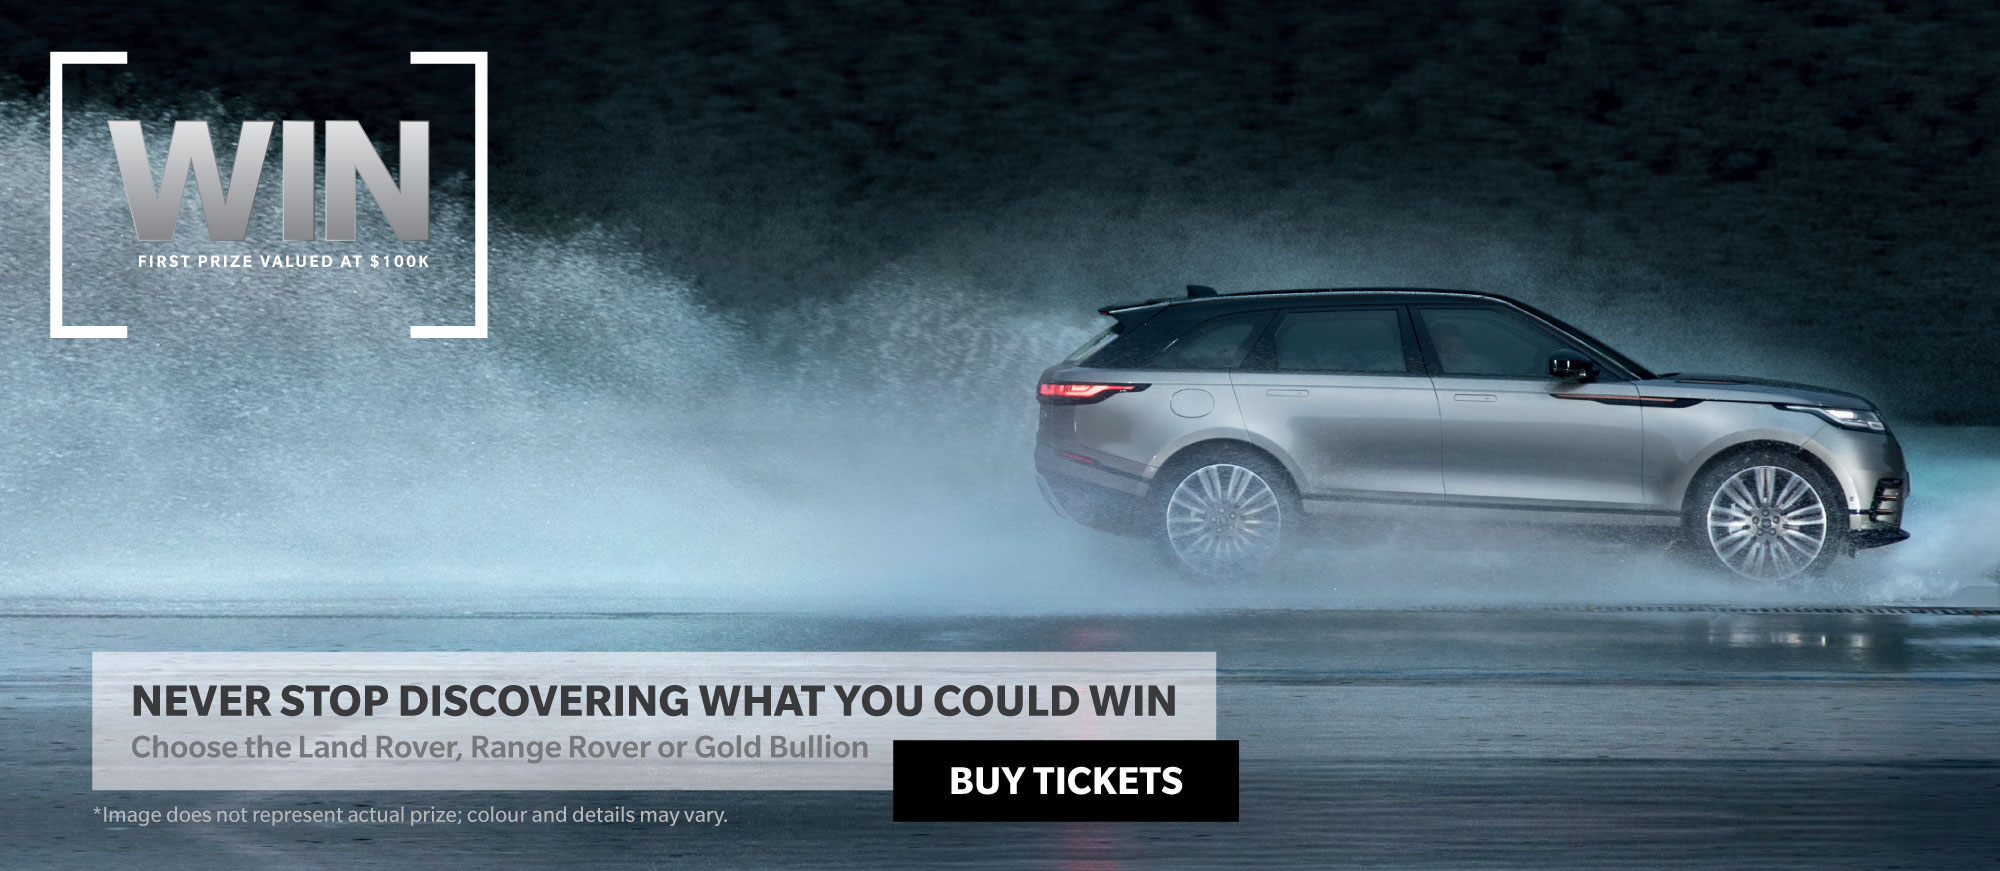 Win a Range Rover Velar or Land Rover Discovery